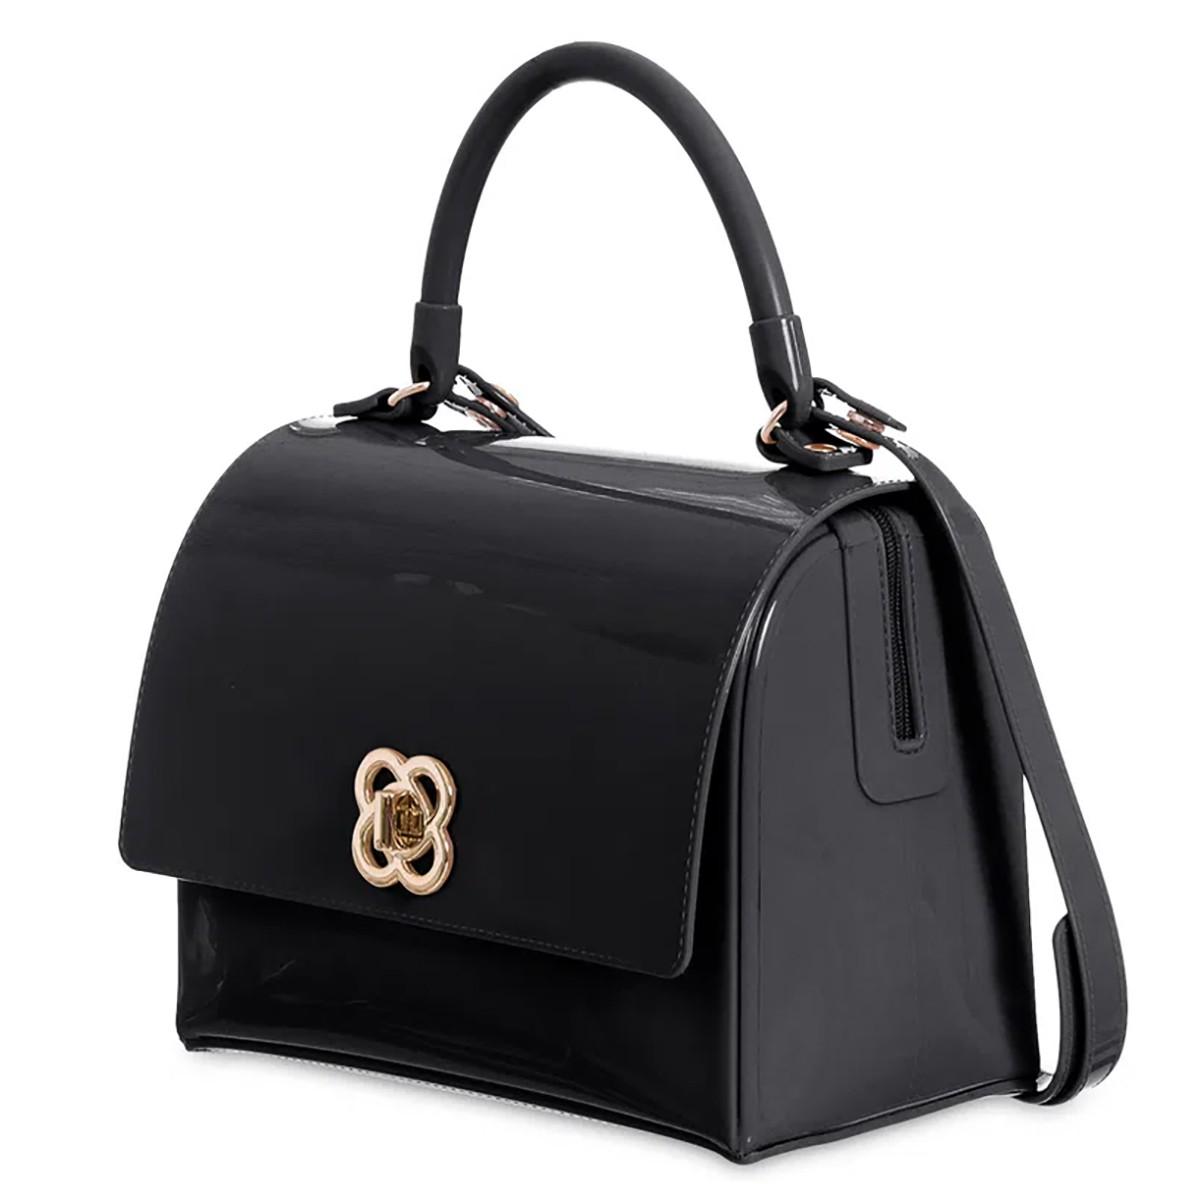 Bolsa Petite Jolie PJ4860 Lana